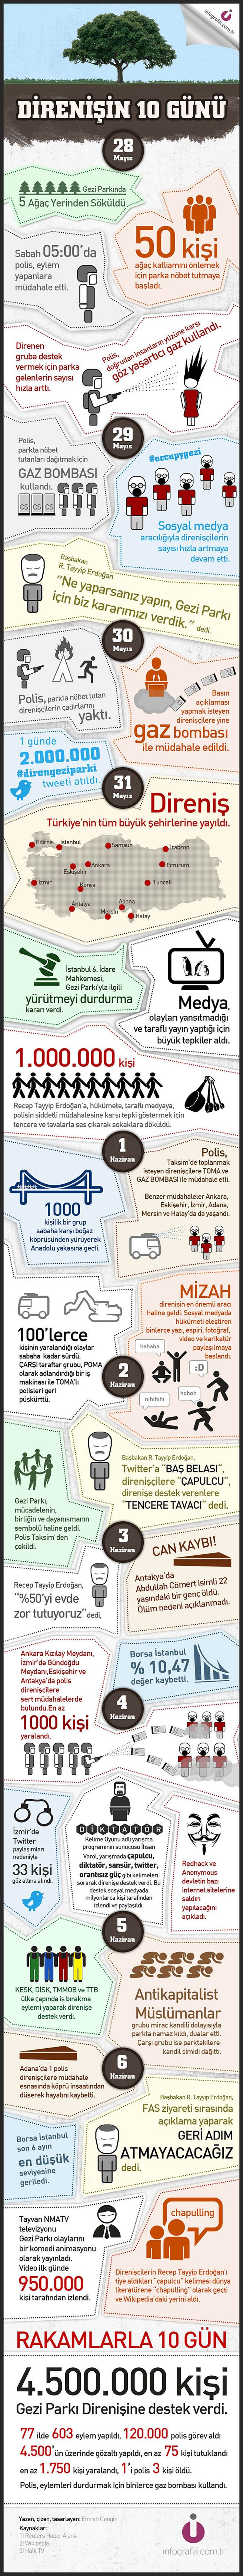 http://infografik.com.tr/wp-content/uploads/2013/06/GeziParki_Infografik.jpg